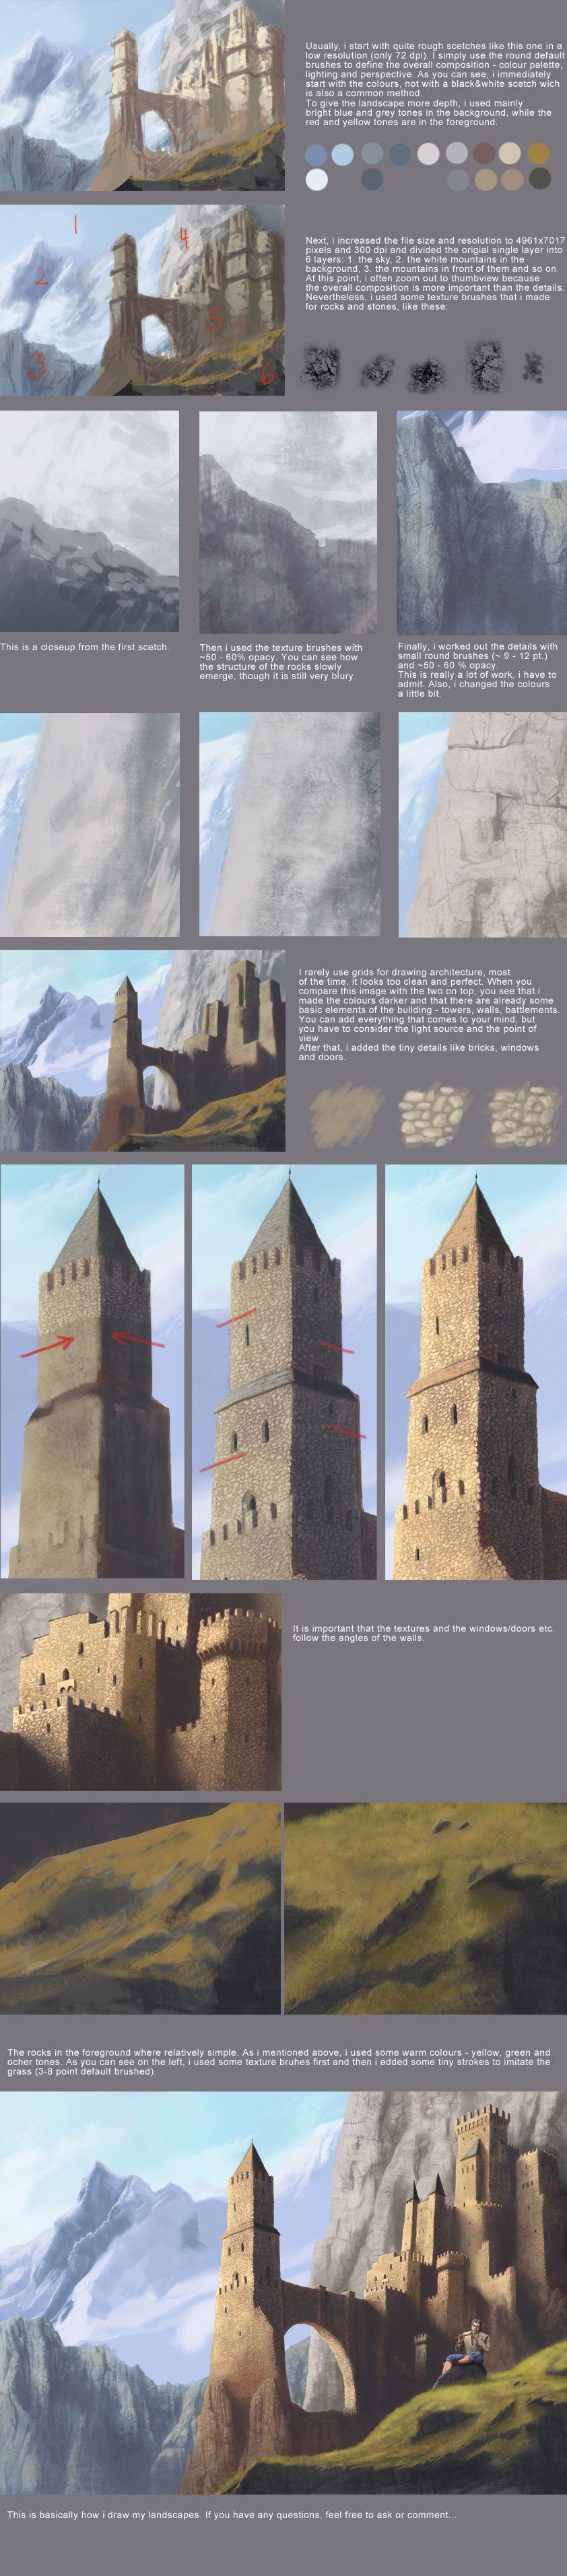 Landscape castle digital painting tutorial for photoshop landscape castle digital painting tutorial for photoshop utilizes textures and color diy baditri Images